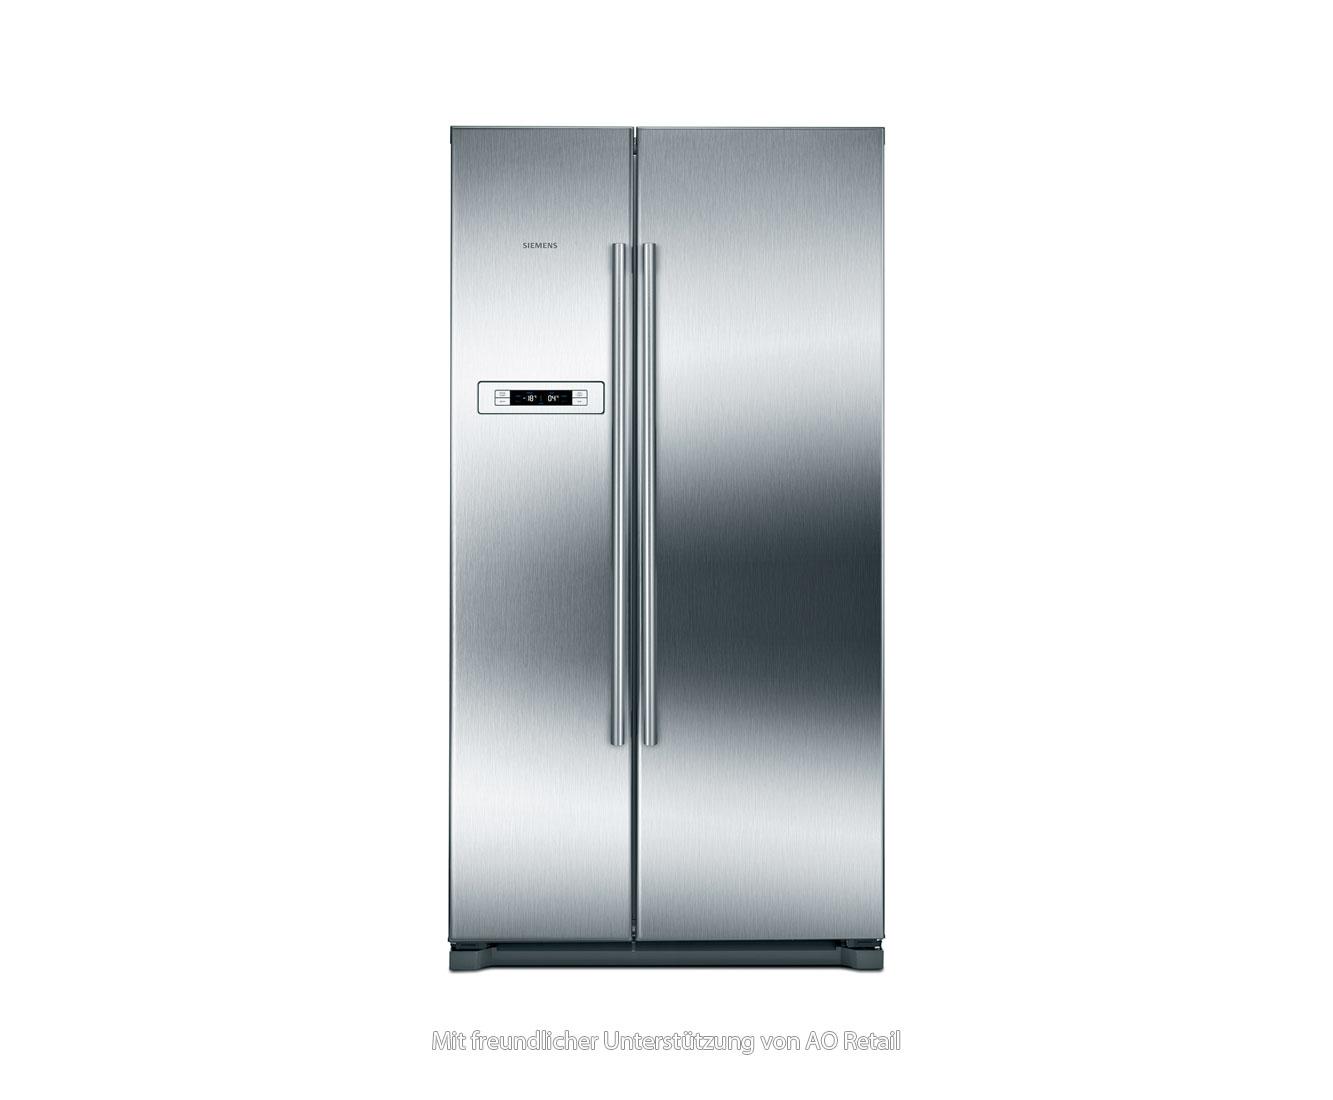 Side By Side Kühlschrank Preis Leistung : Side by side kühlschrank preisvergleich u die besten angebote